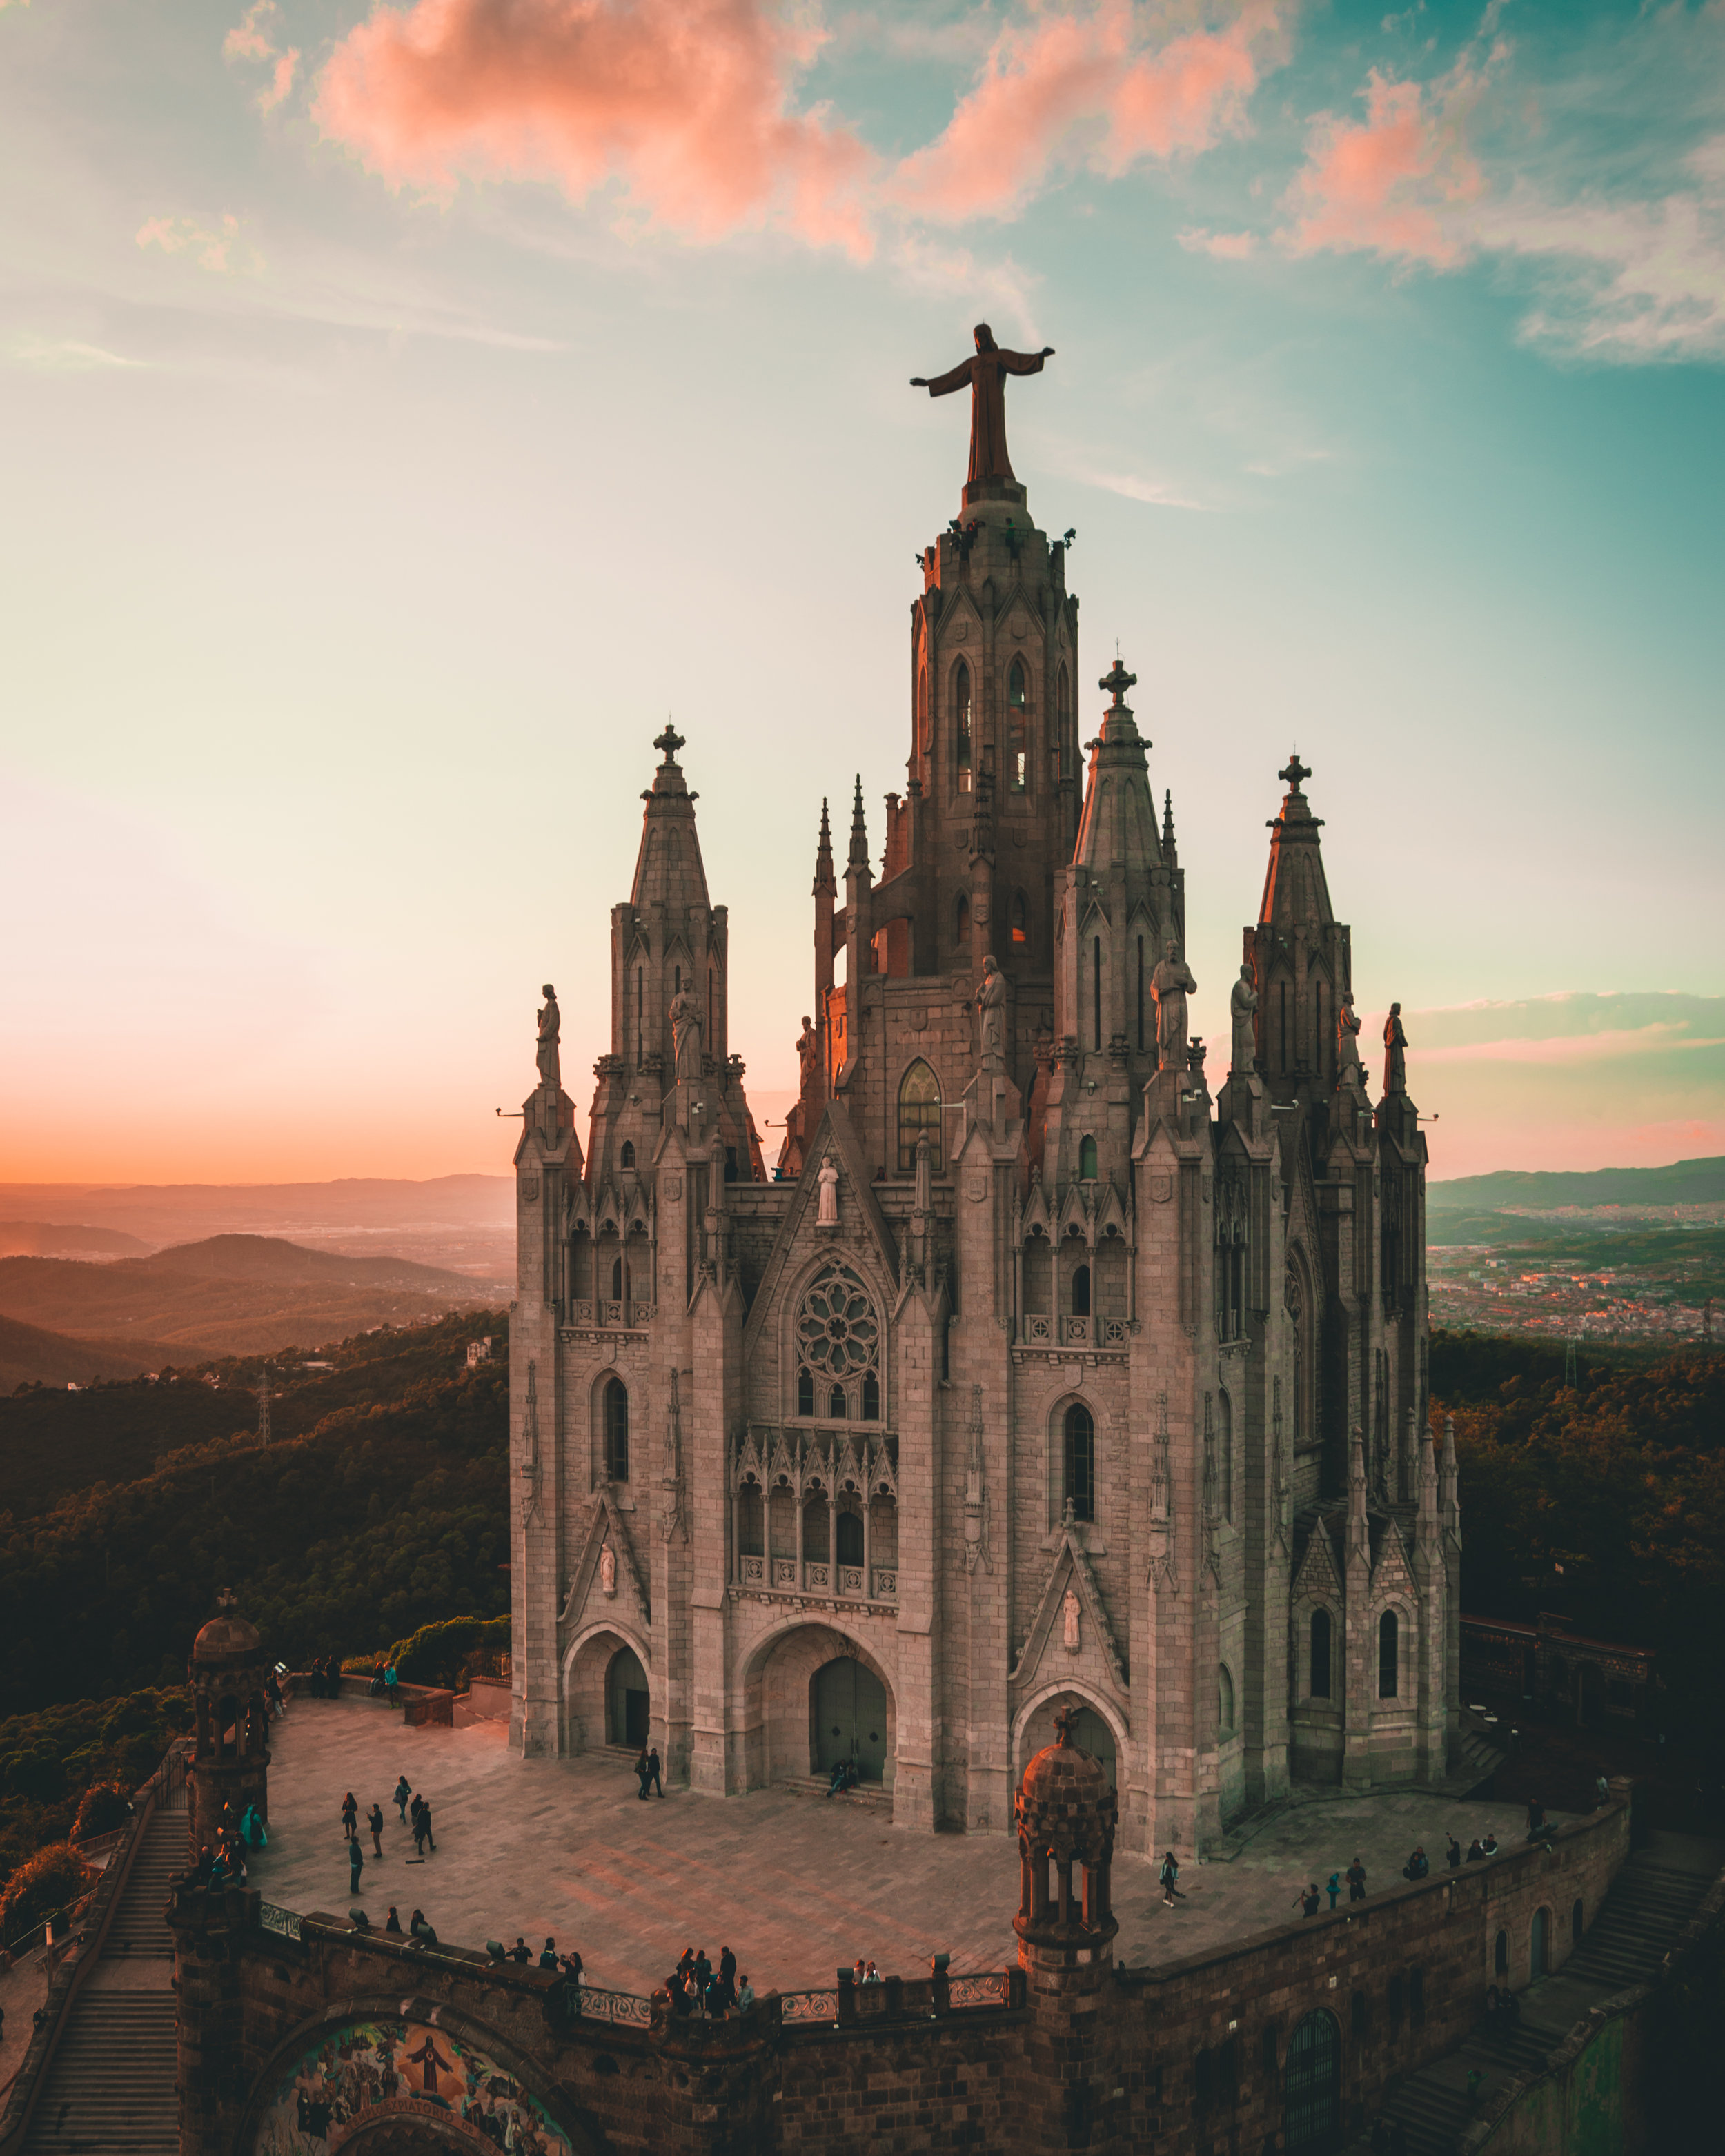 Temple Expiatori del Sagrat Cor, Barcelona, Spain